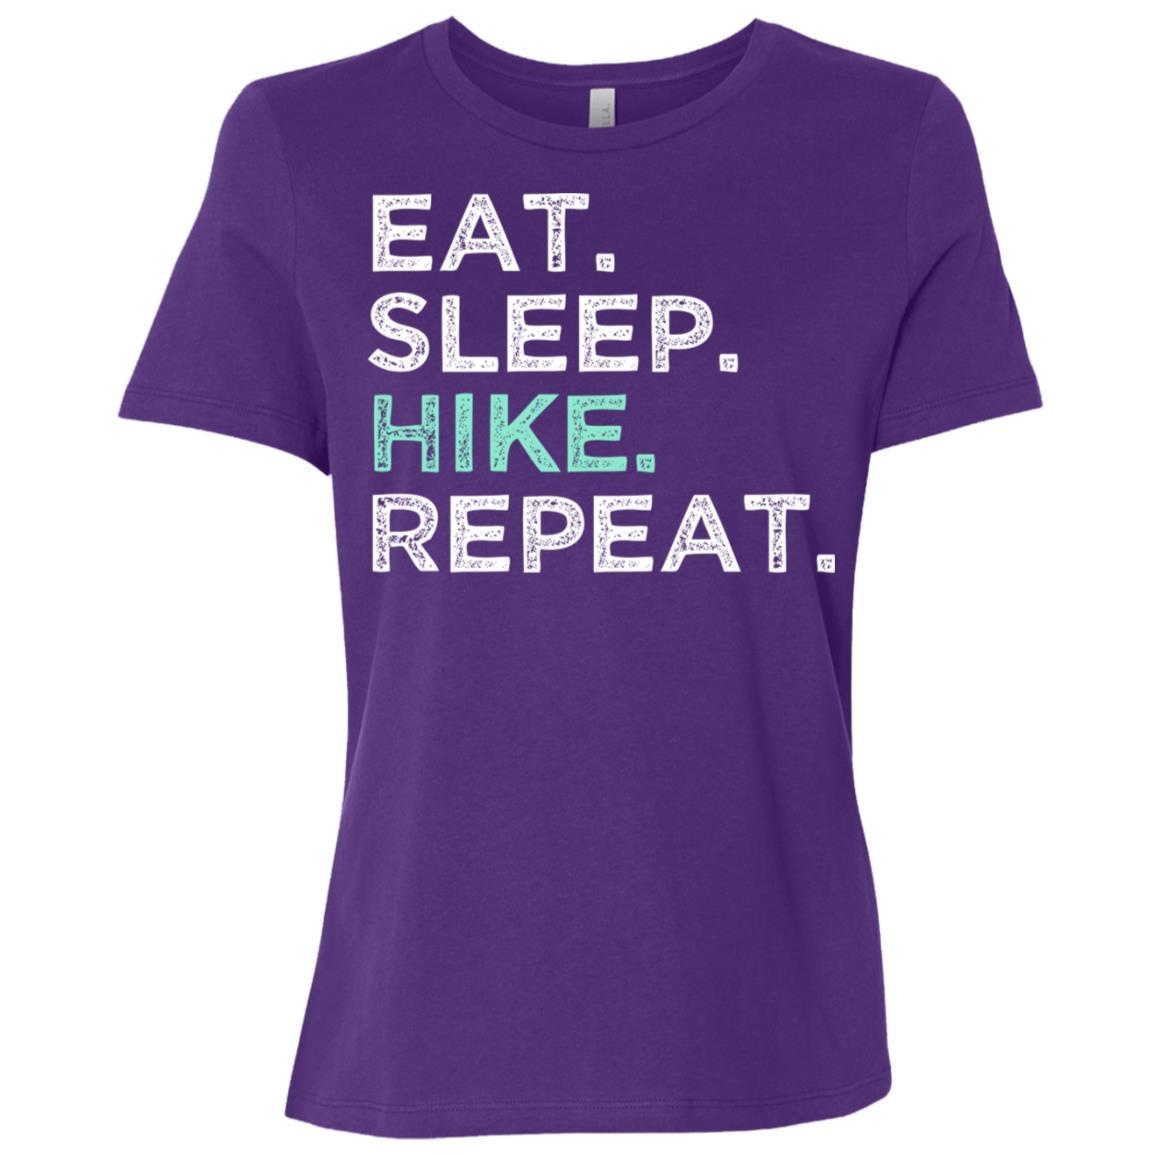 Eat Sleep Hike Repeat. Funny Hiking Women Short Sleeve T-Shirt